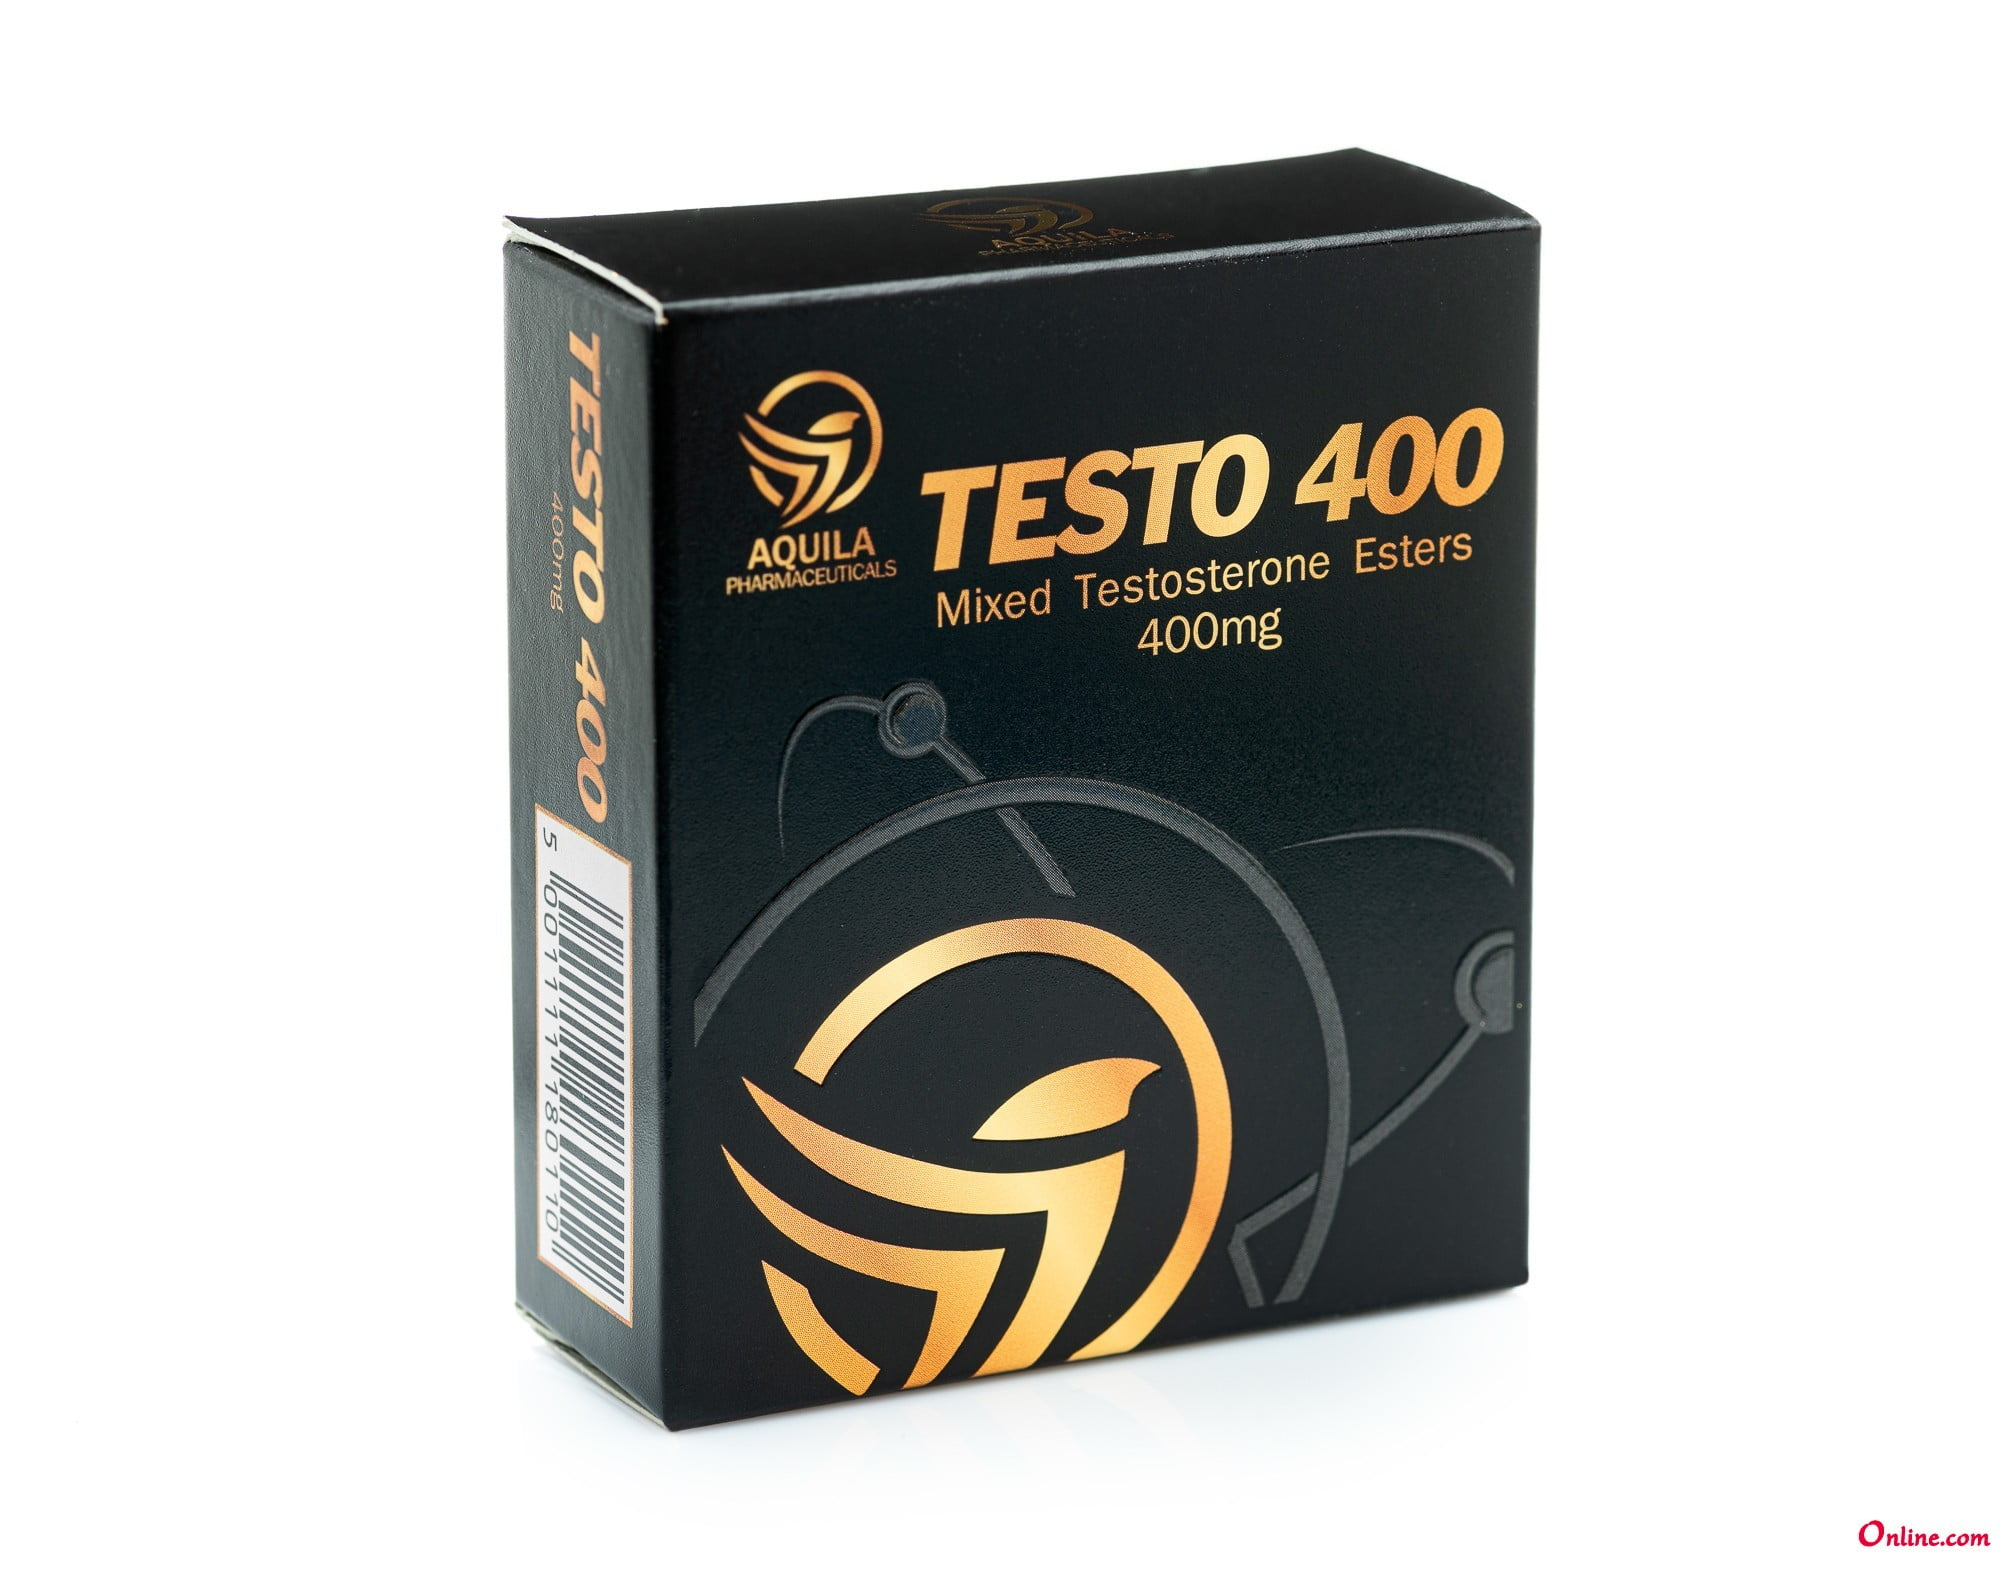 TESTO 400 Mixed Testosterone Esters 400 mg